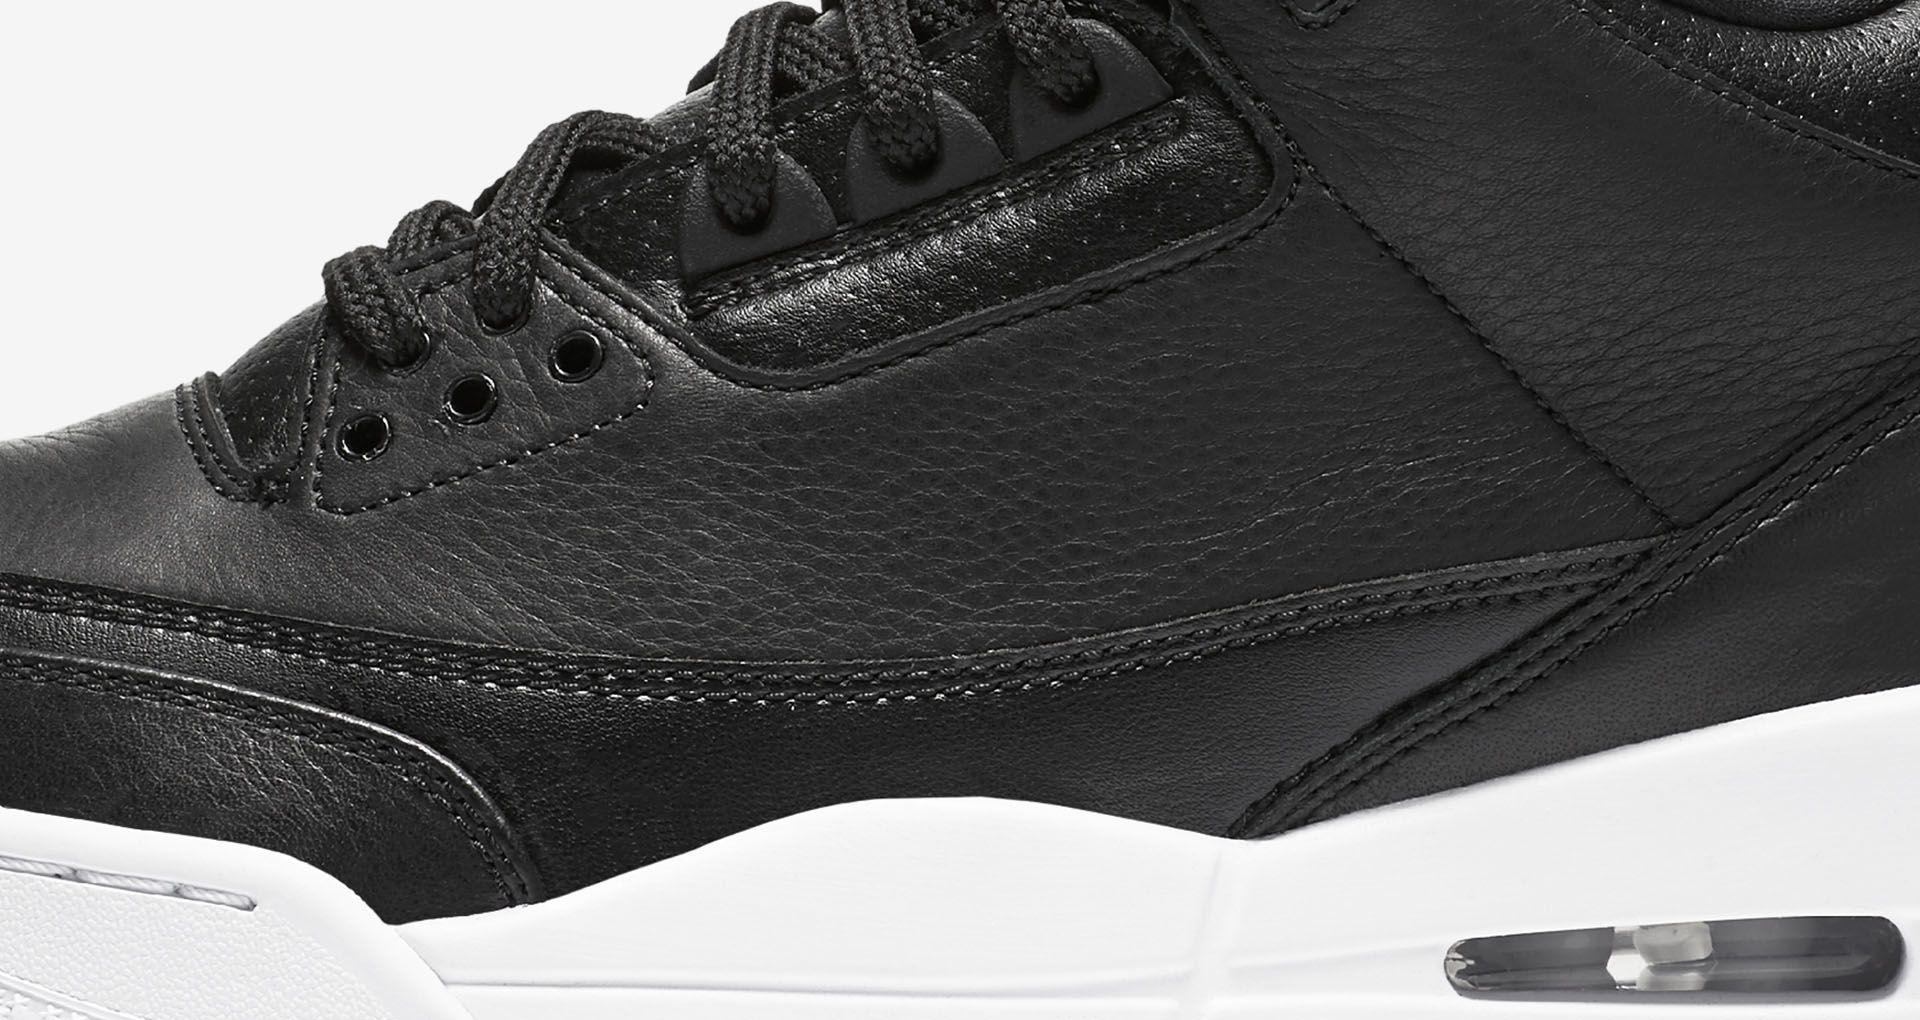 b3240cca8f18 Air Jordan 3 Retro  Black   White  Release Date. Nike+ SNKRS